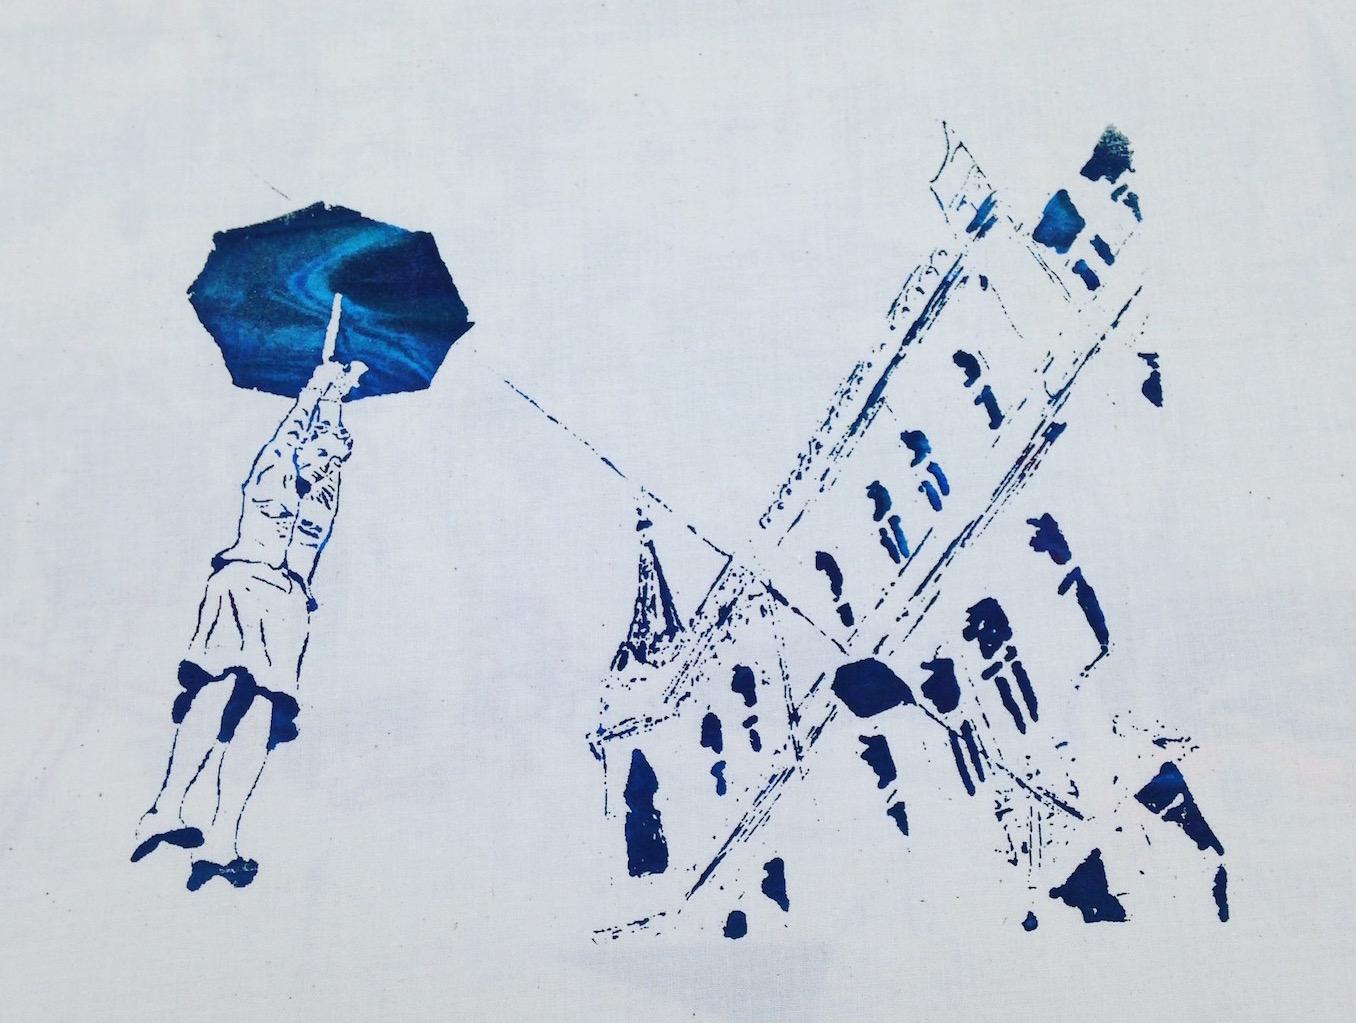 umbrellalady